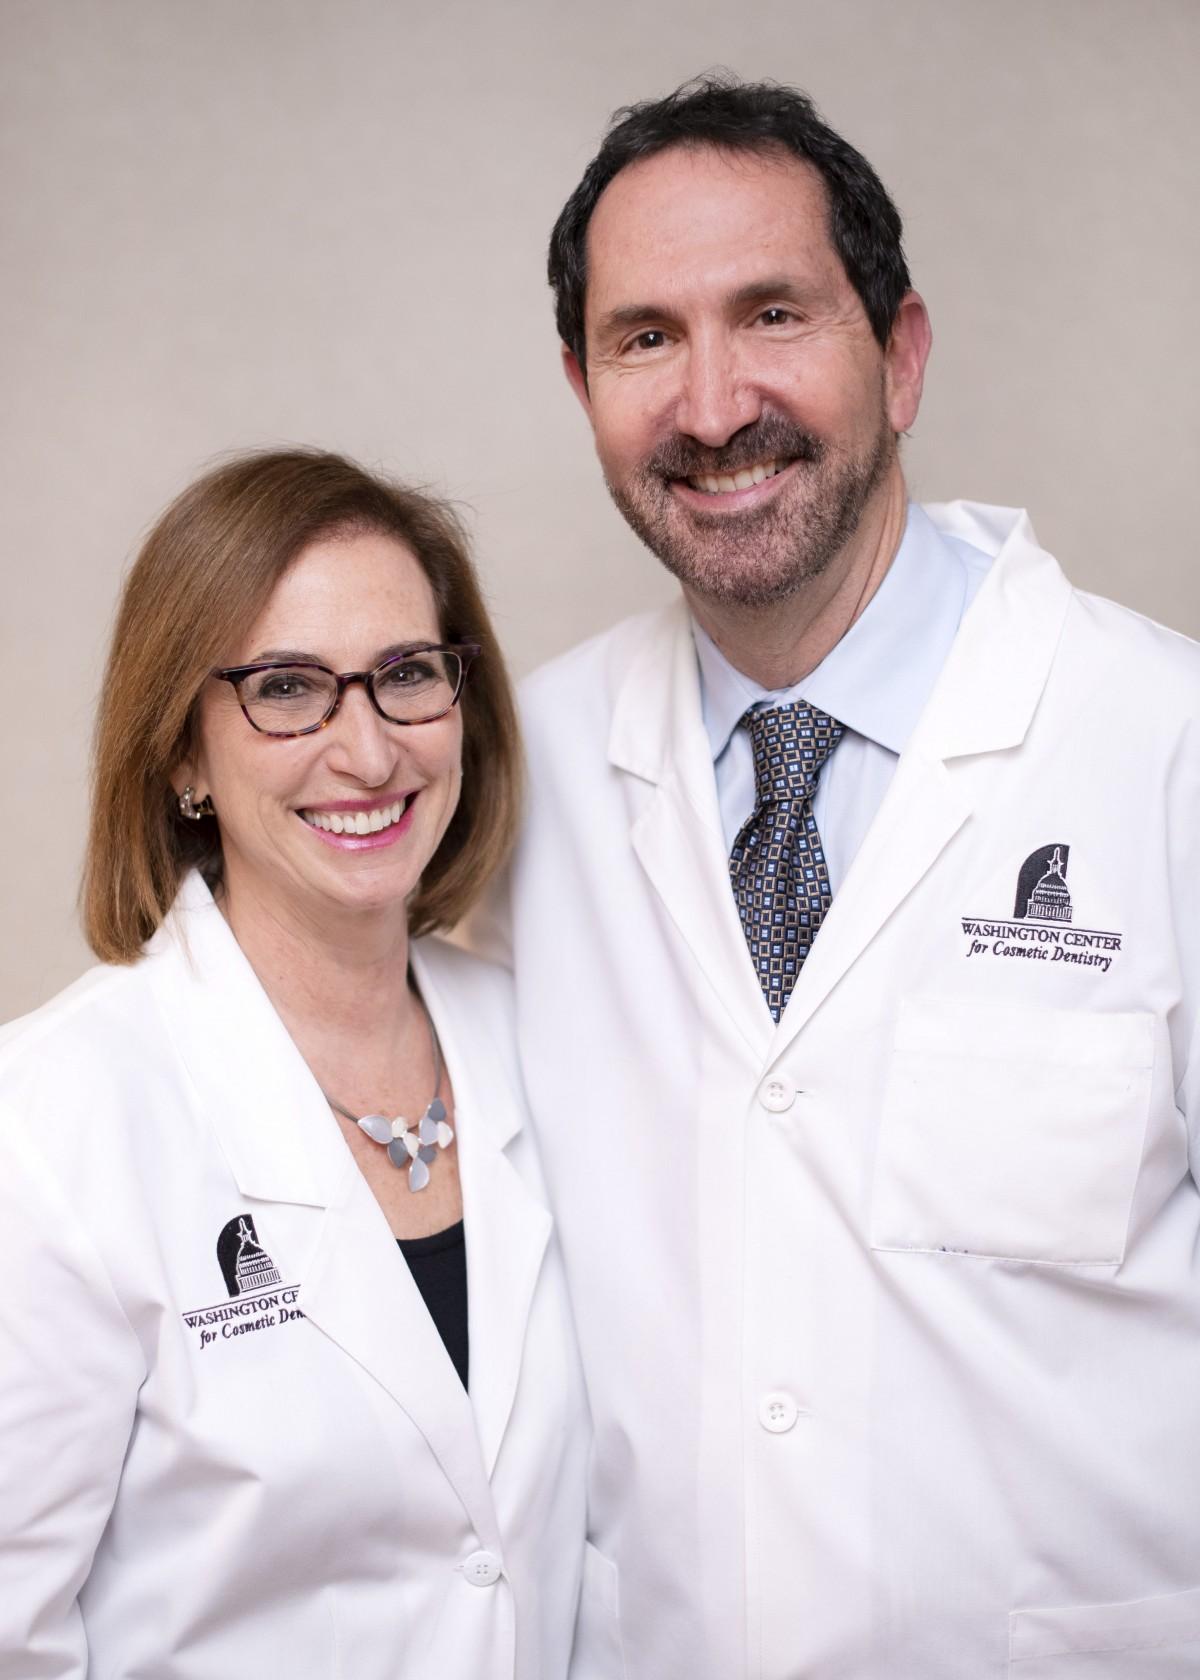 Washington DC Dentist Dr. Michael Pollowitz Provides World Class Dental Services